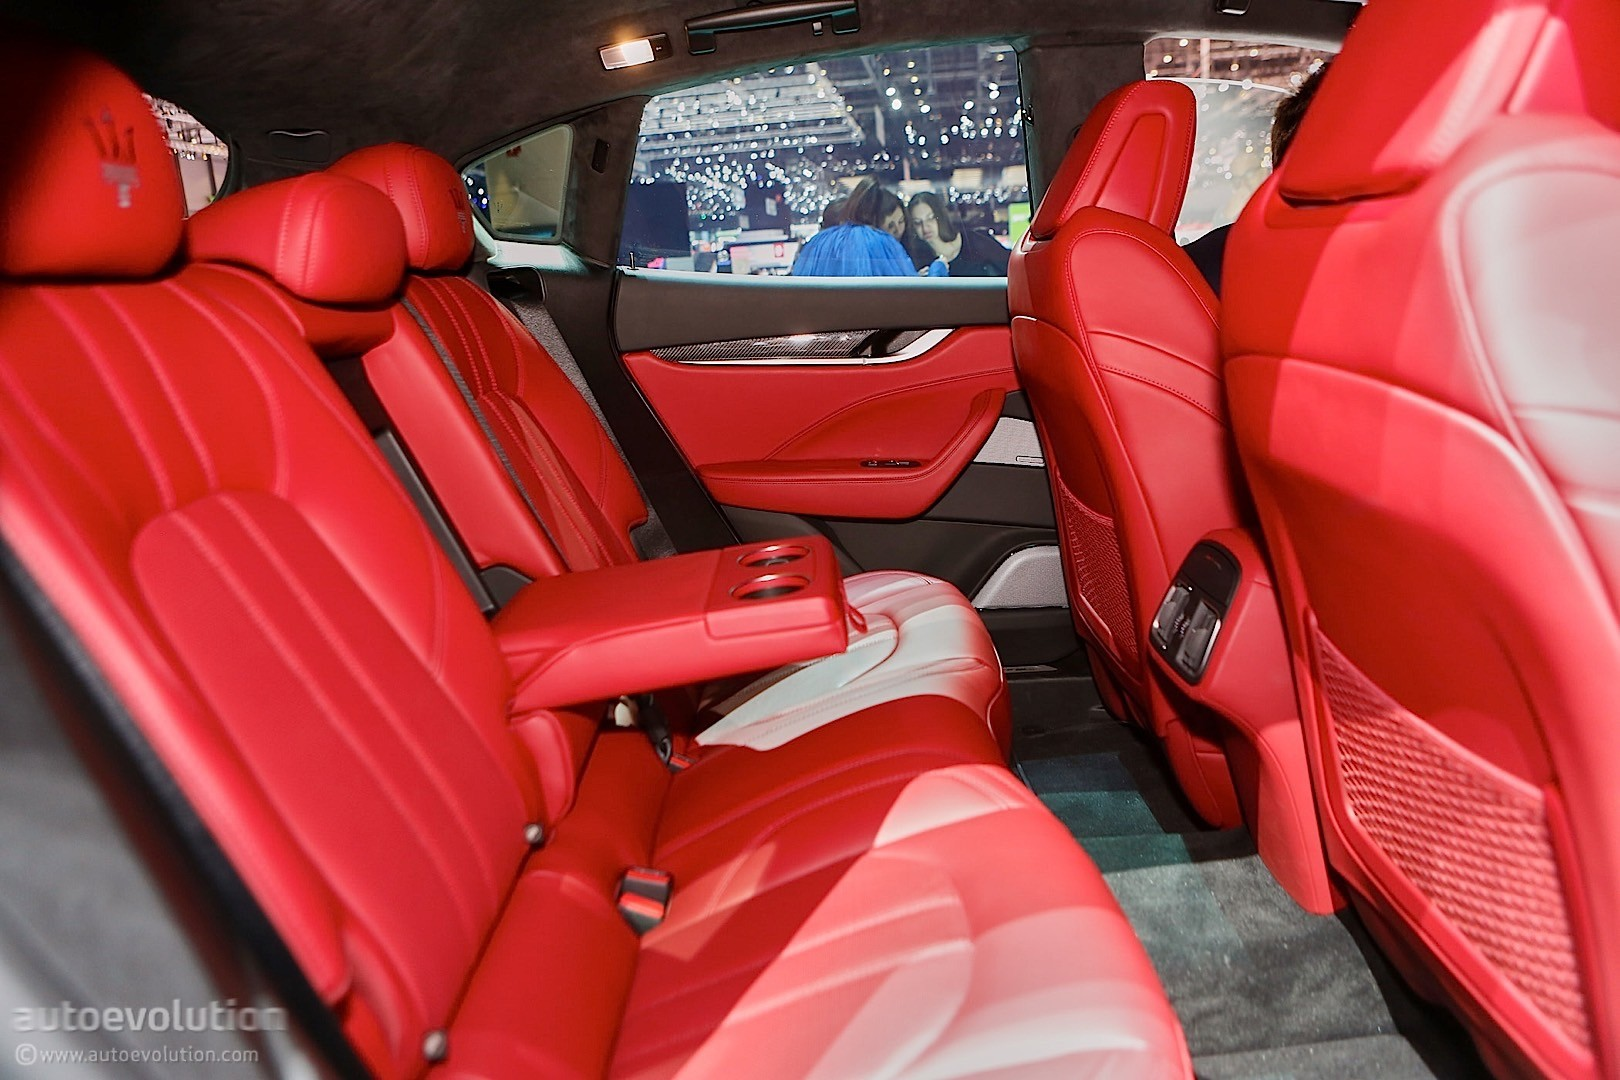 Maserati Levante SUV Looks like a Ghibli on Stilts in Geneva - autoevolution